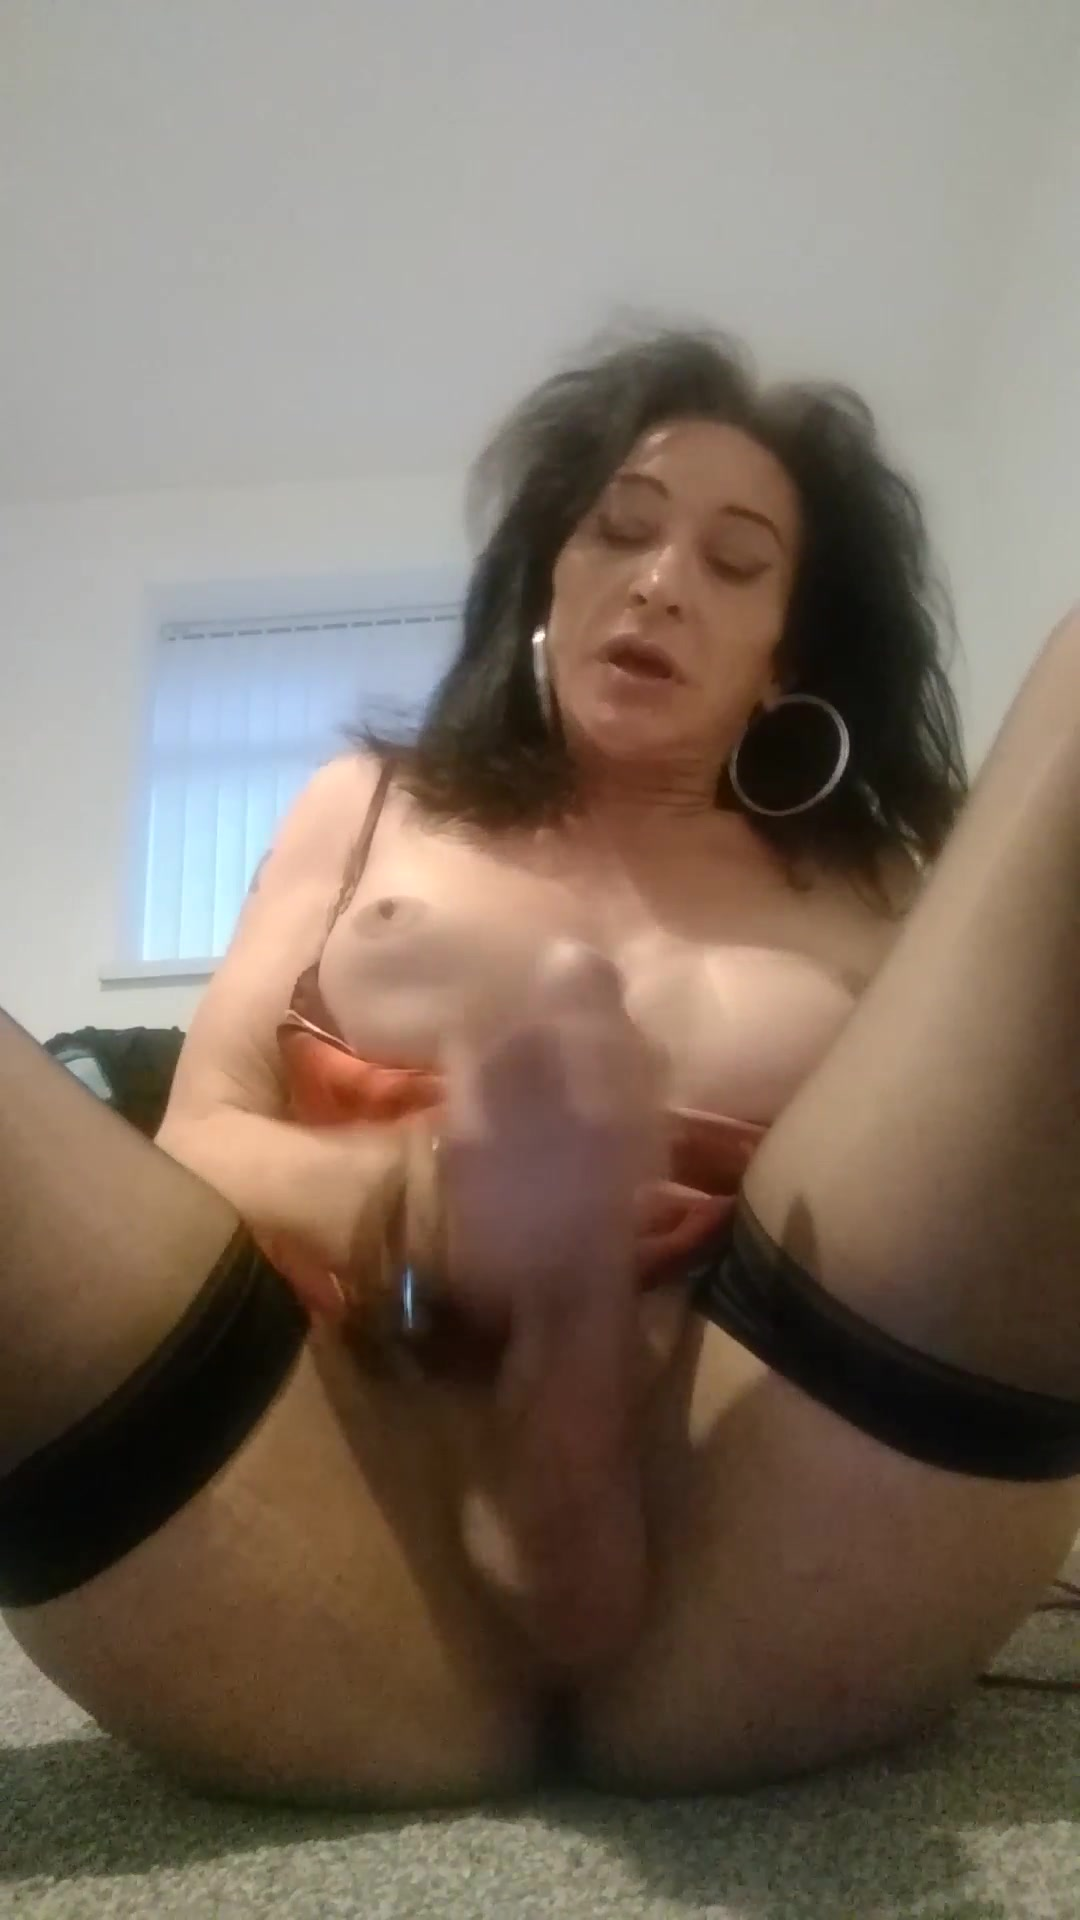 Amigas Se Masturban Juntas https://anon-v/videos/222813/groped-bikini-girls